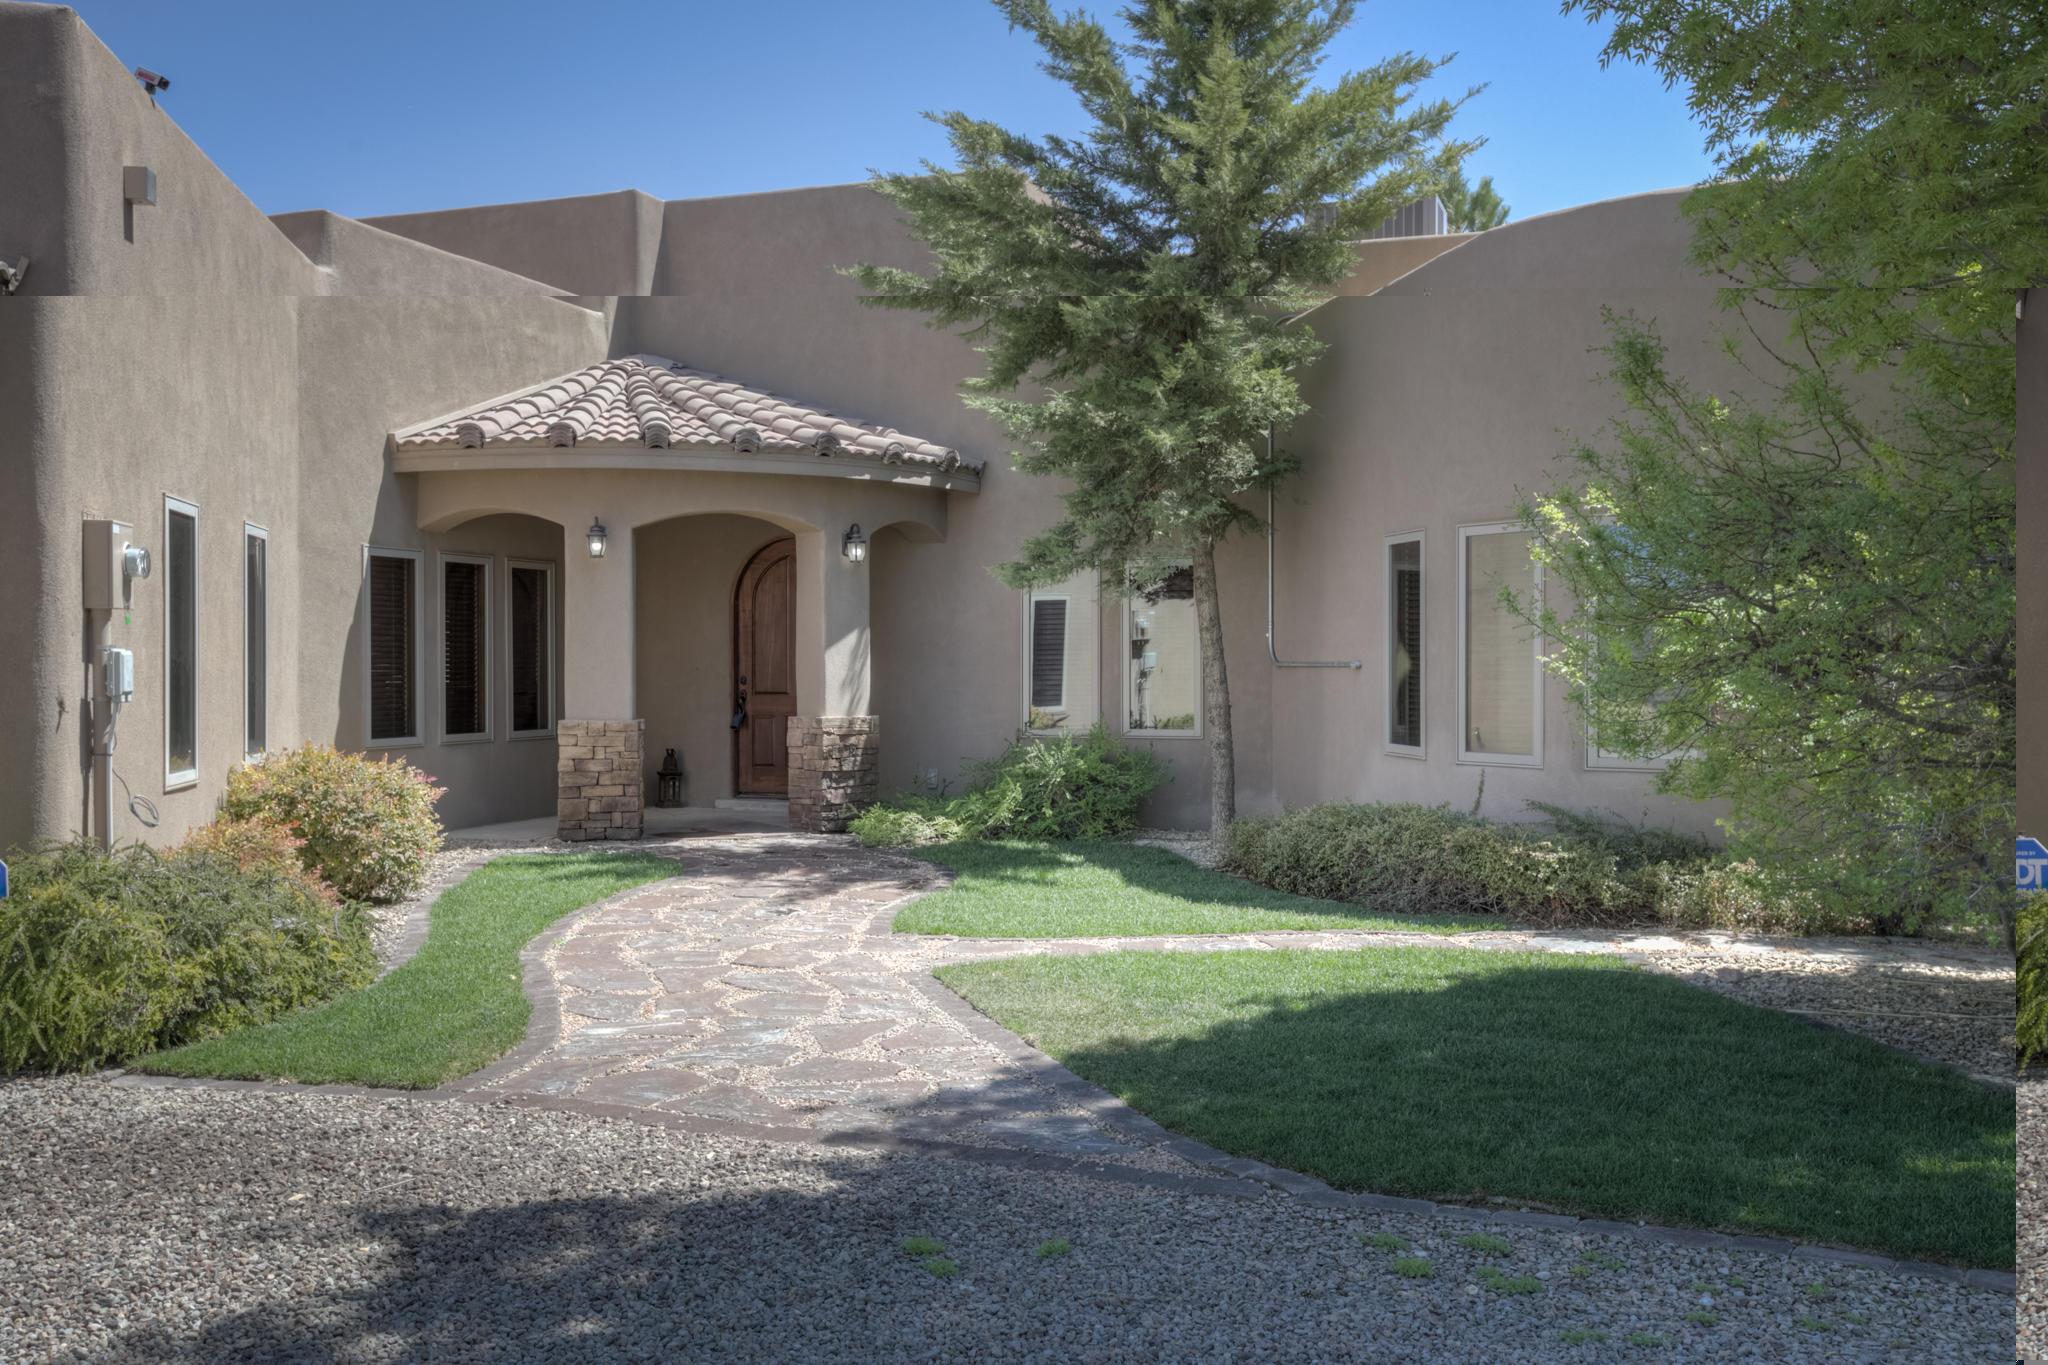 120 Savannah Lane, Corrales, NM 87048 - Corrales, NM real estate listing